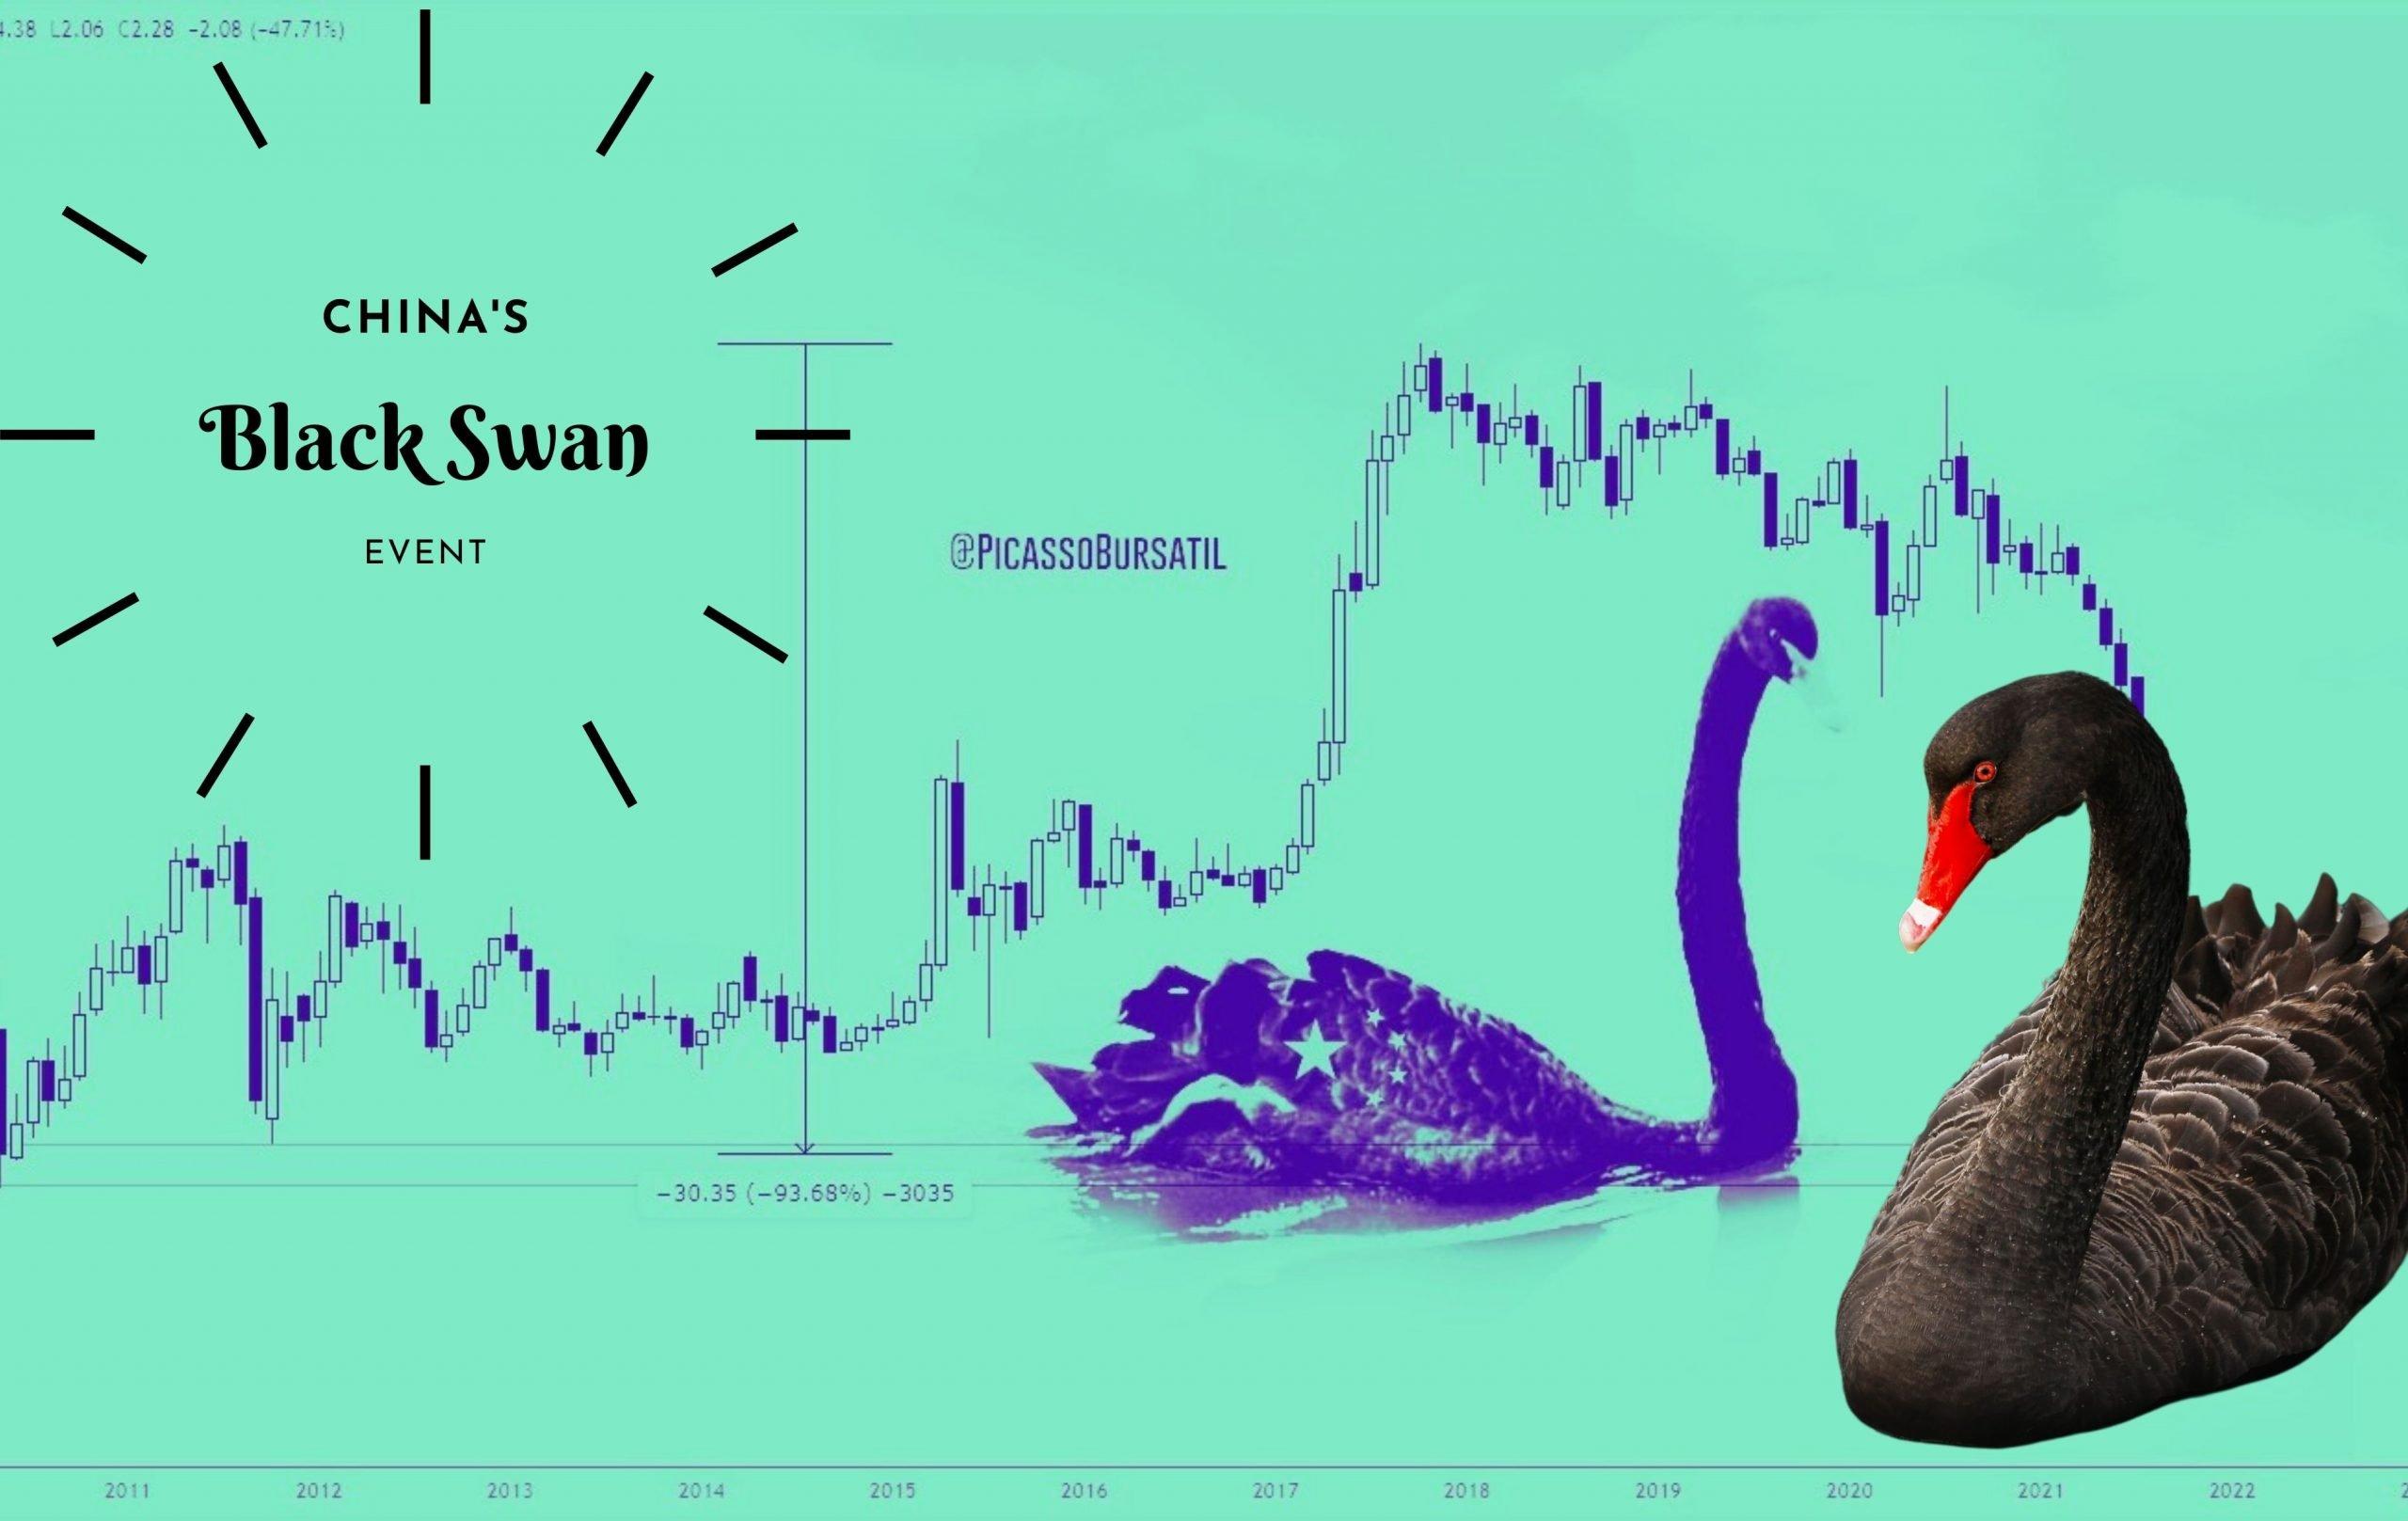 Evergrande: China's Black Swan Event Threatens to Crash China's Banks & Spread to Global Economy